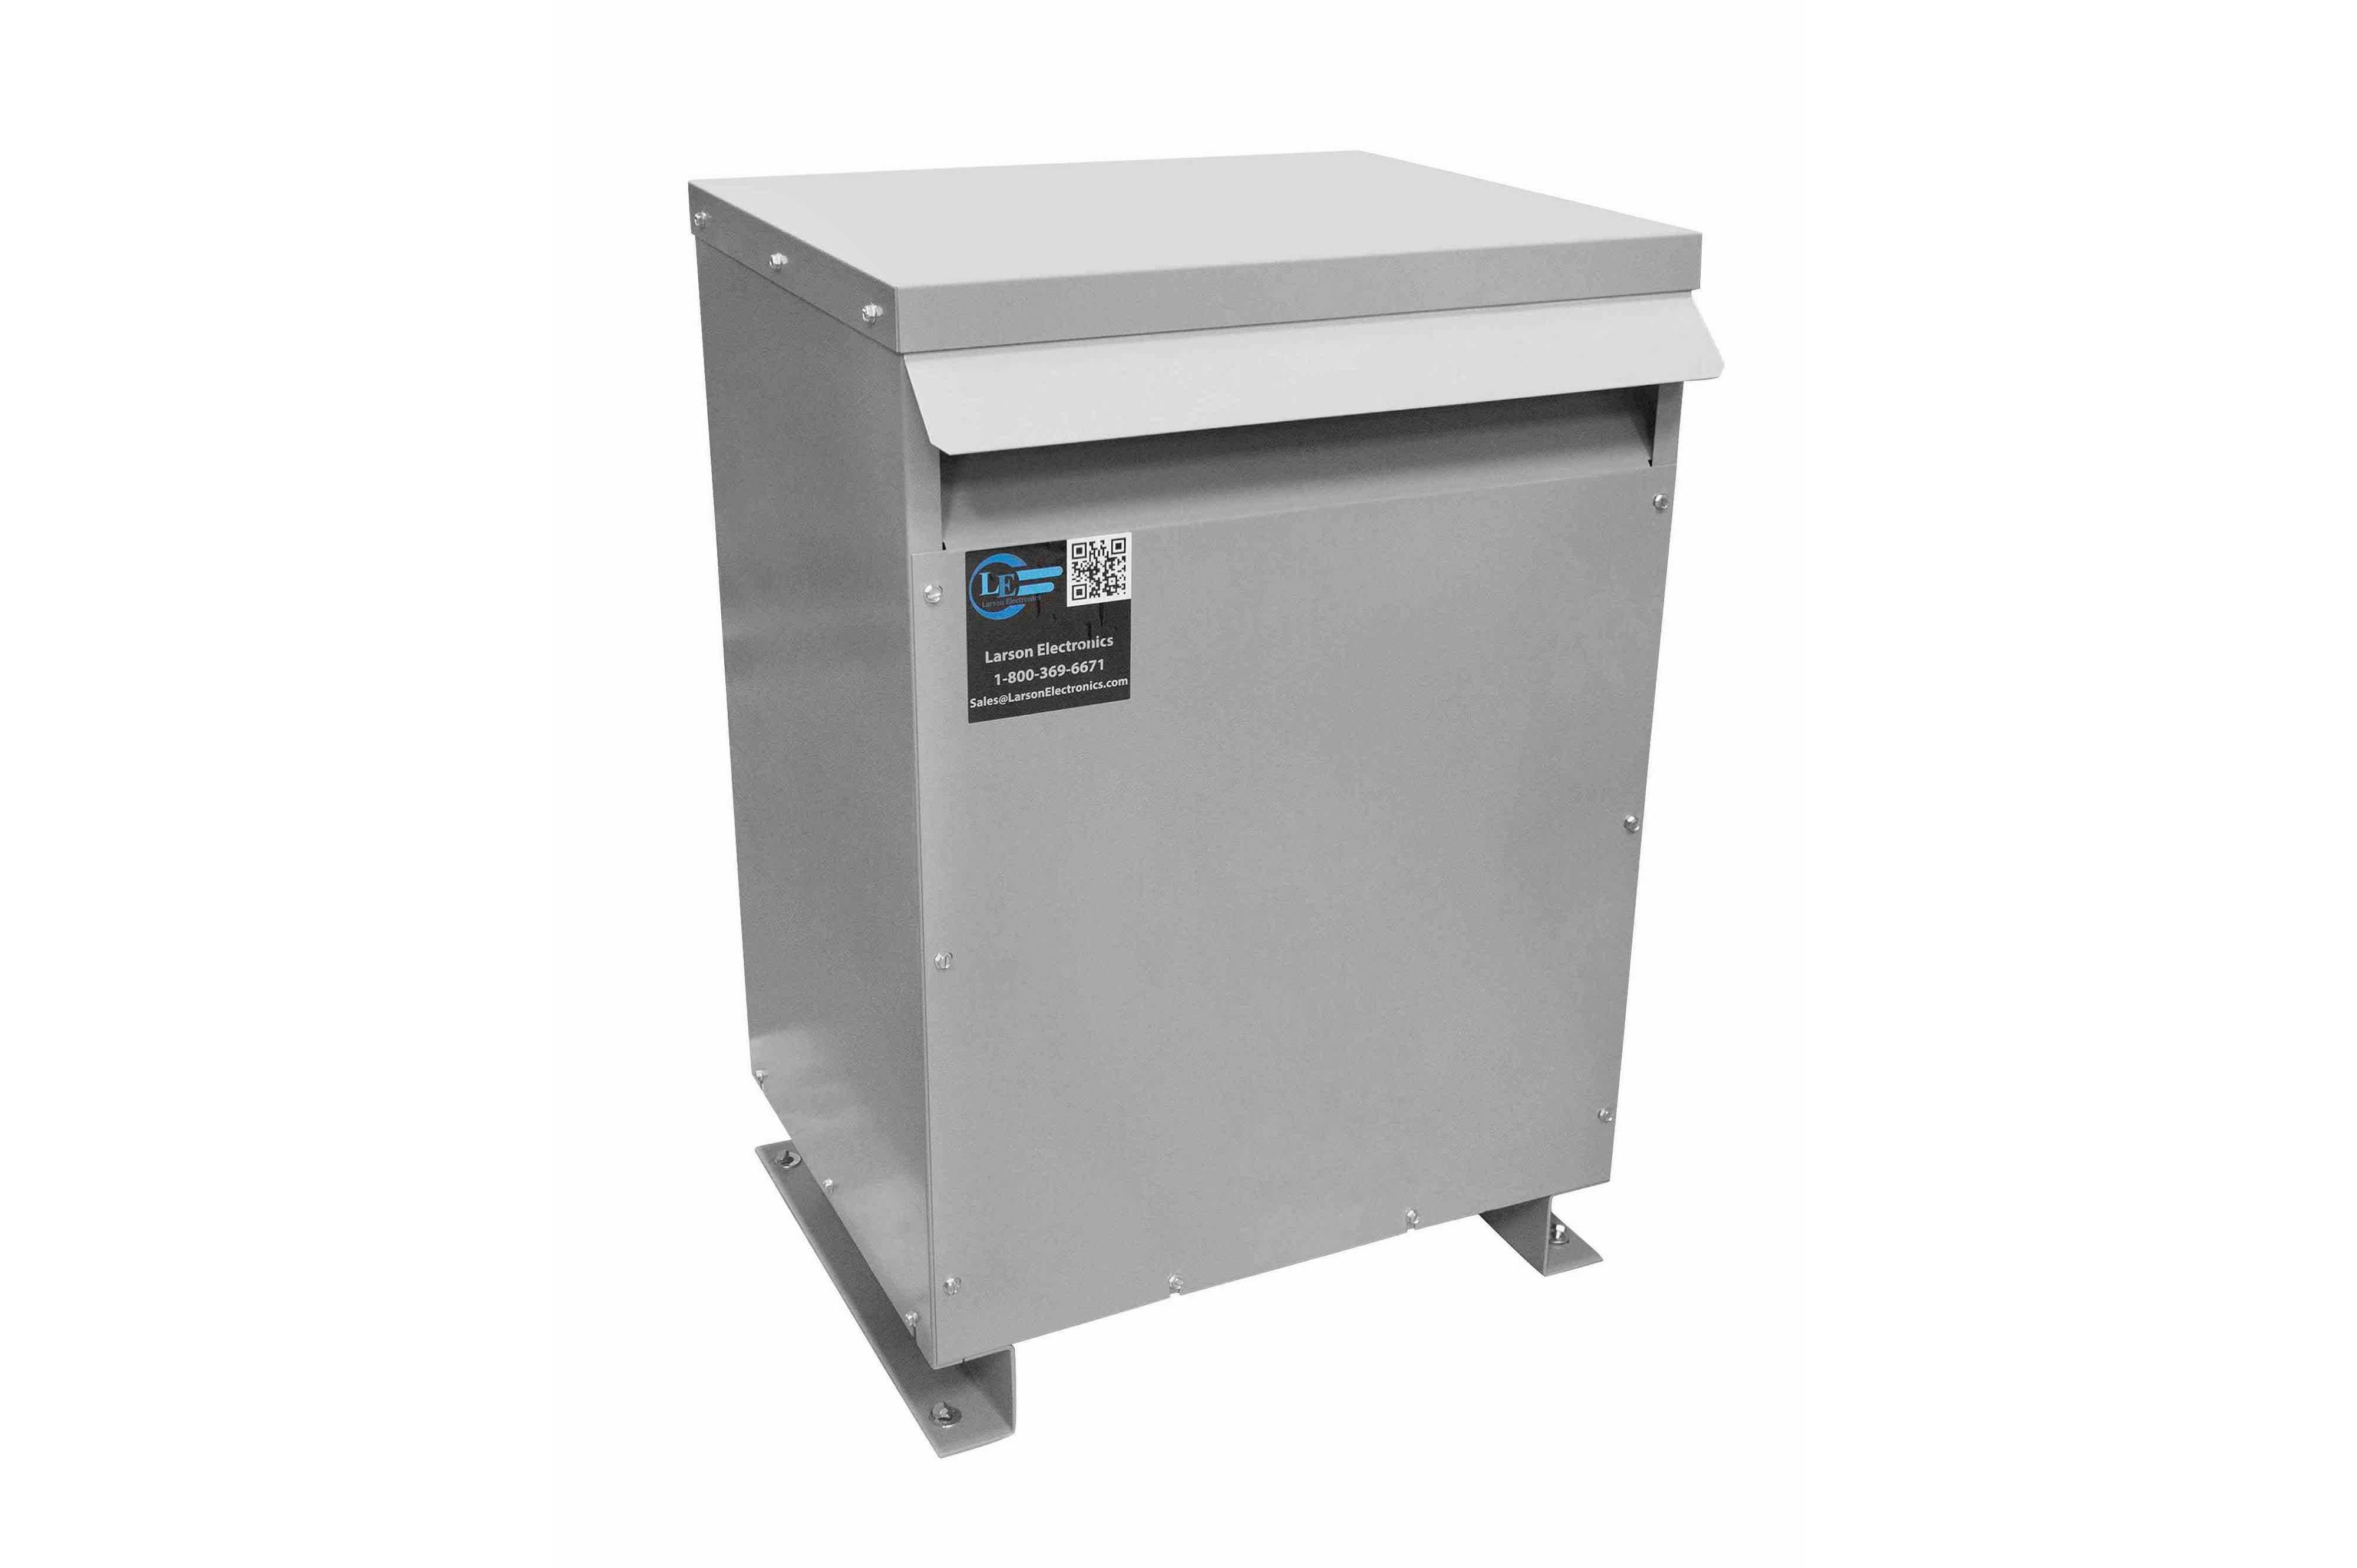 20 kVA 3PH Isolation Transformer, 480V Wye Primary, 400V Delta Secondary, N3R, Ventilated, 60 Hz